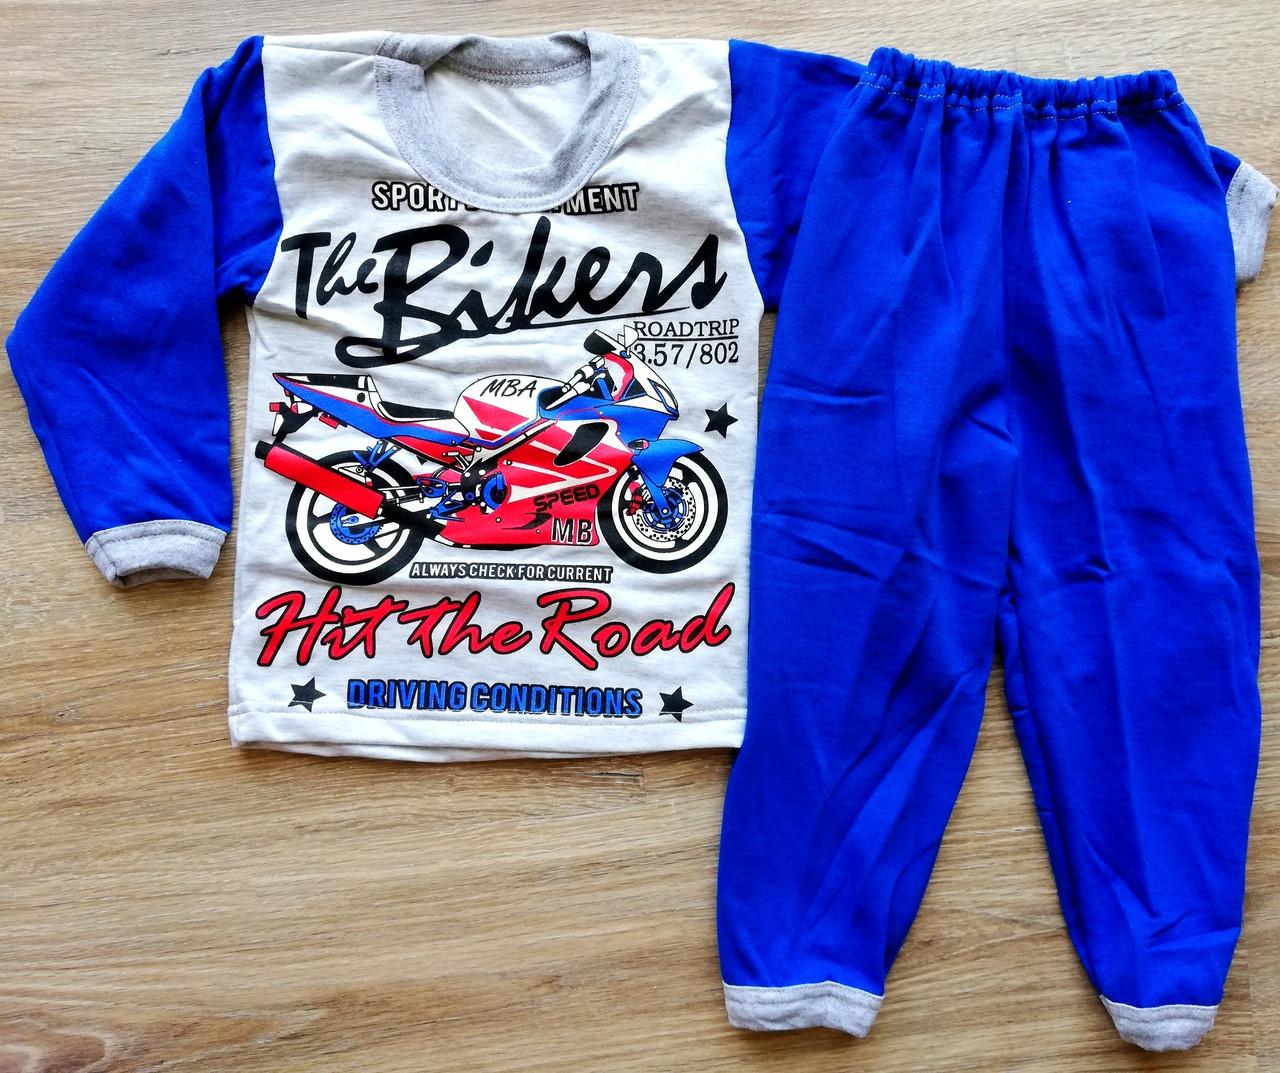 Детская тёплая пижама на байке THE BIKERS на мальчика 28 и 30